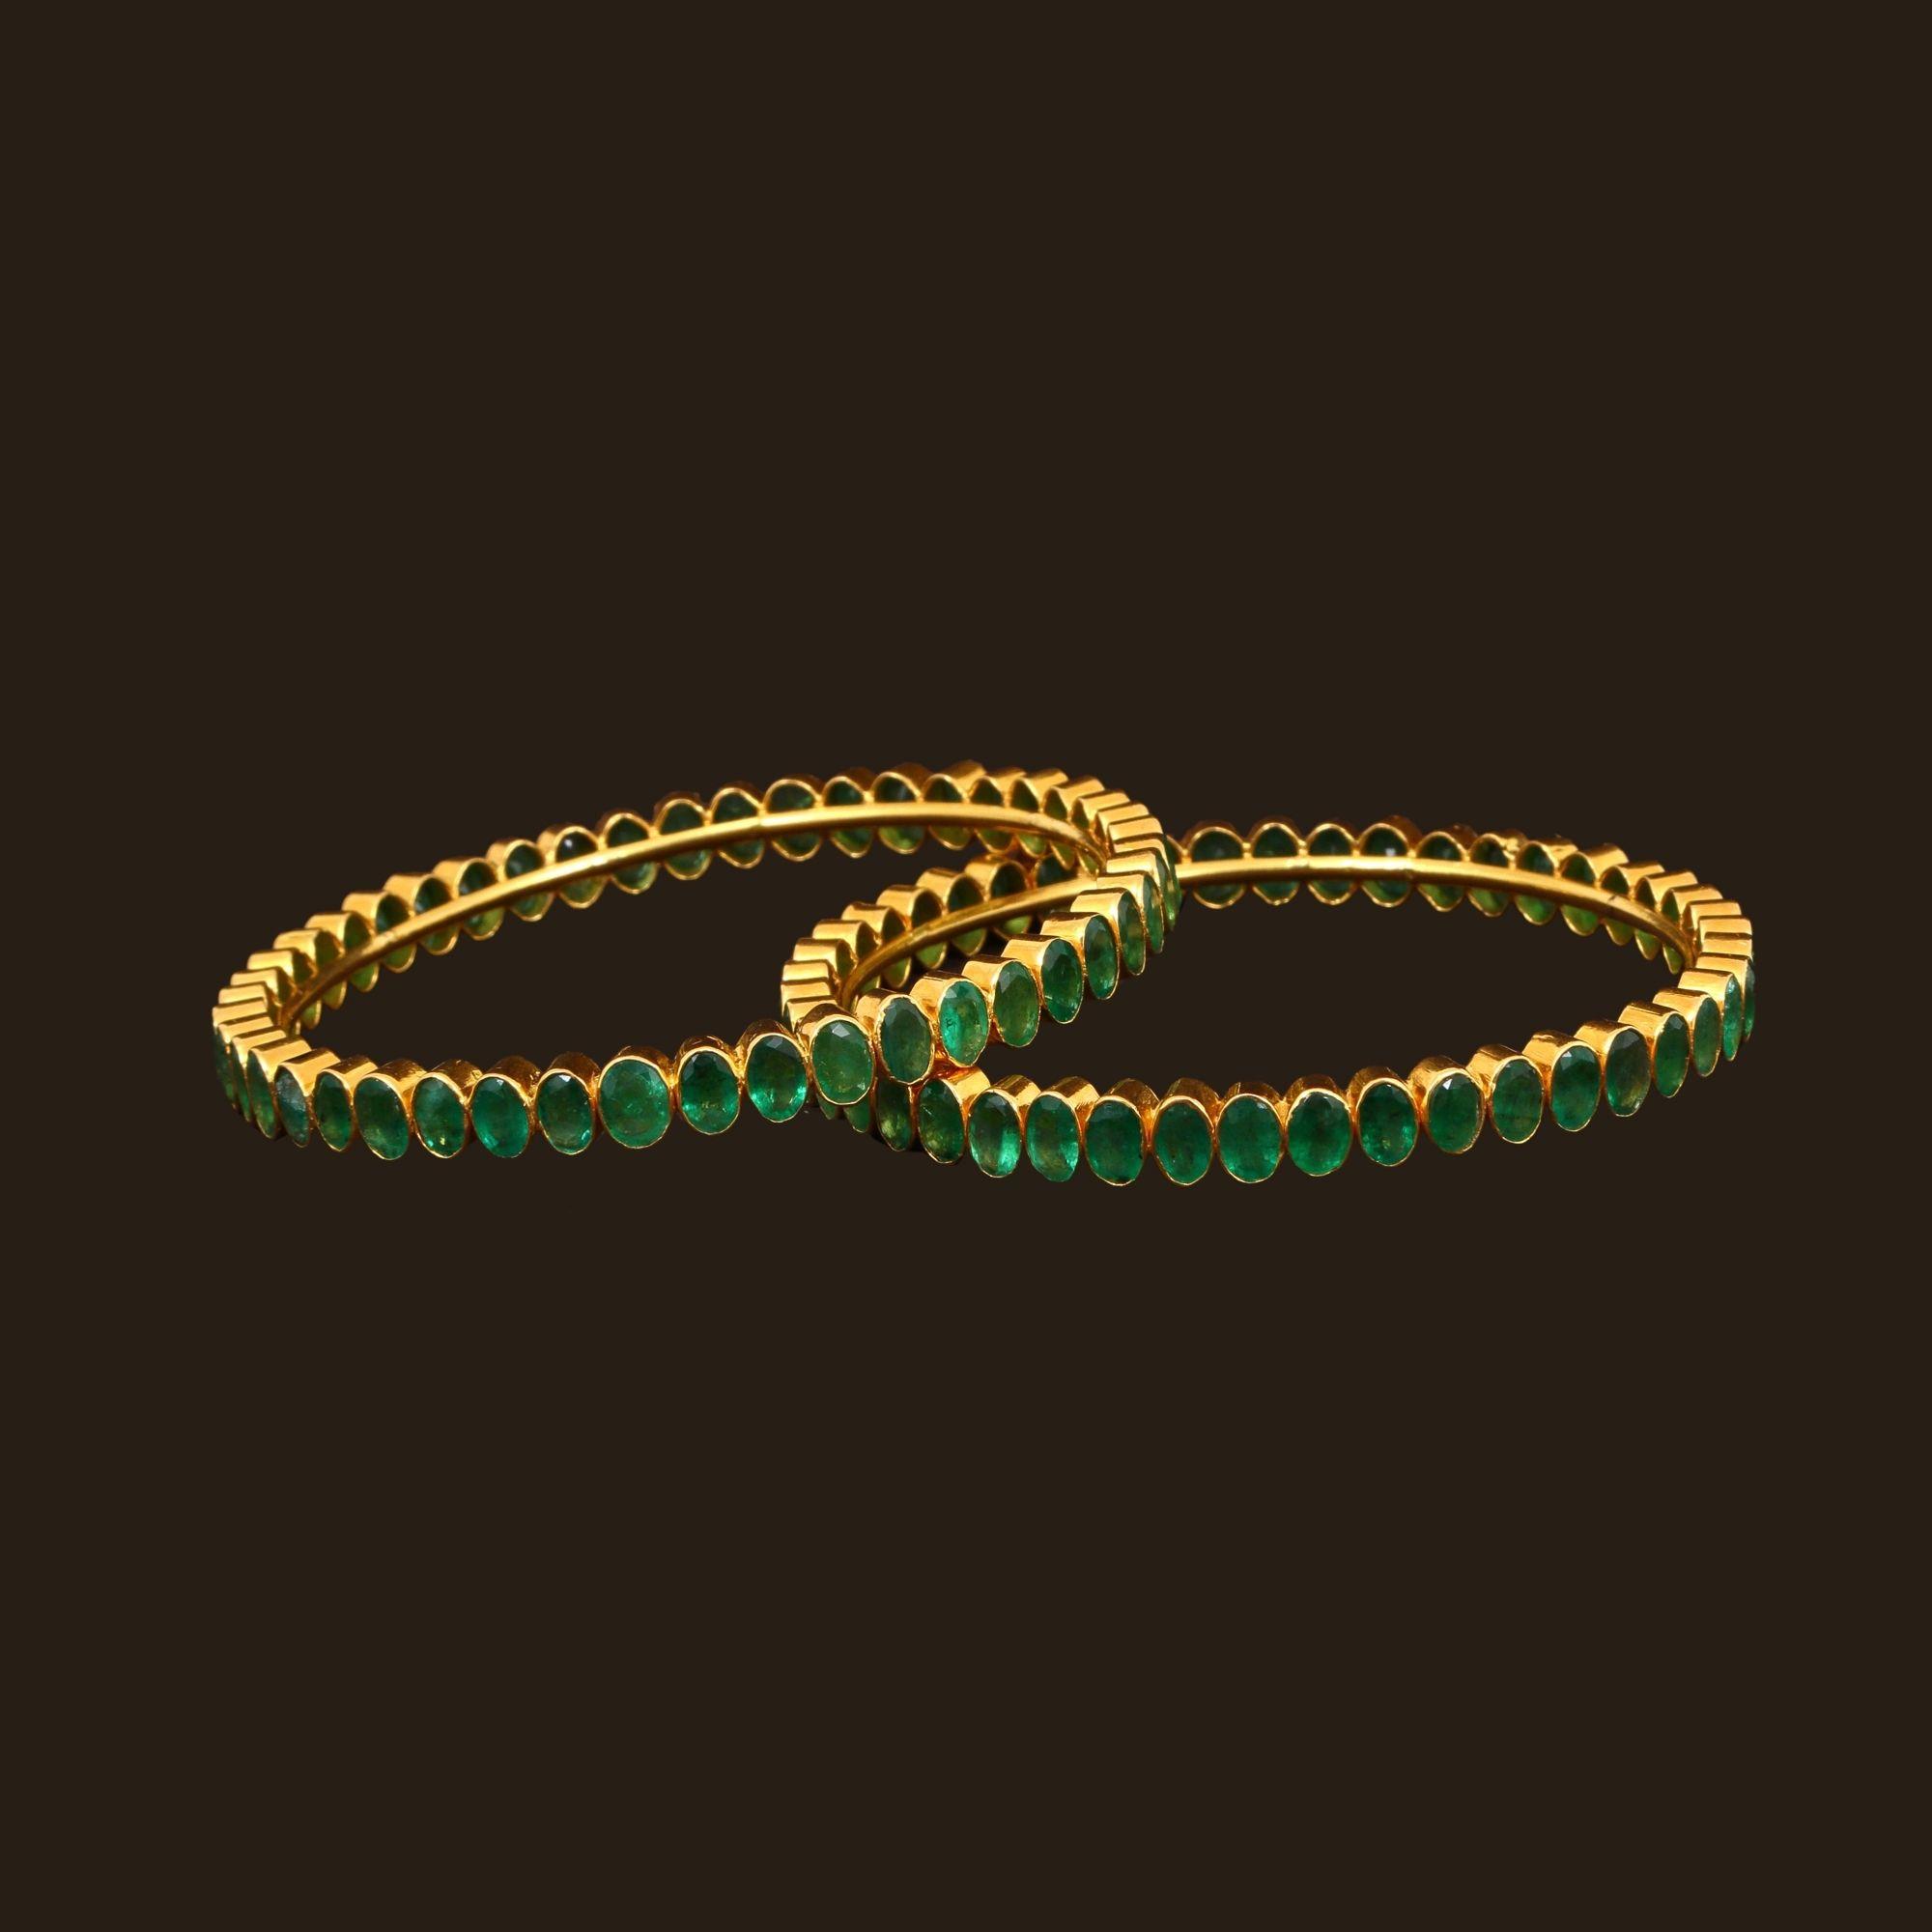 Emerald bangles 101a1302 gold bangles design gold